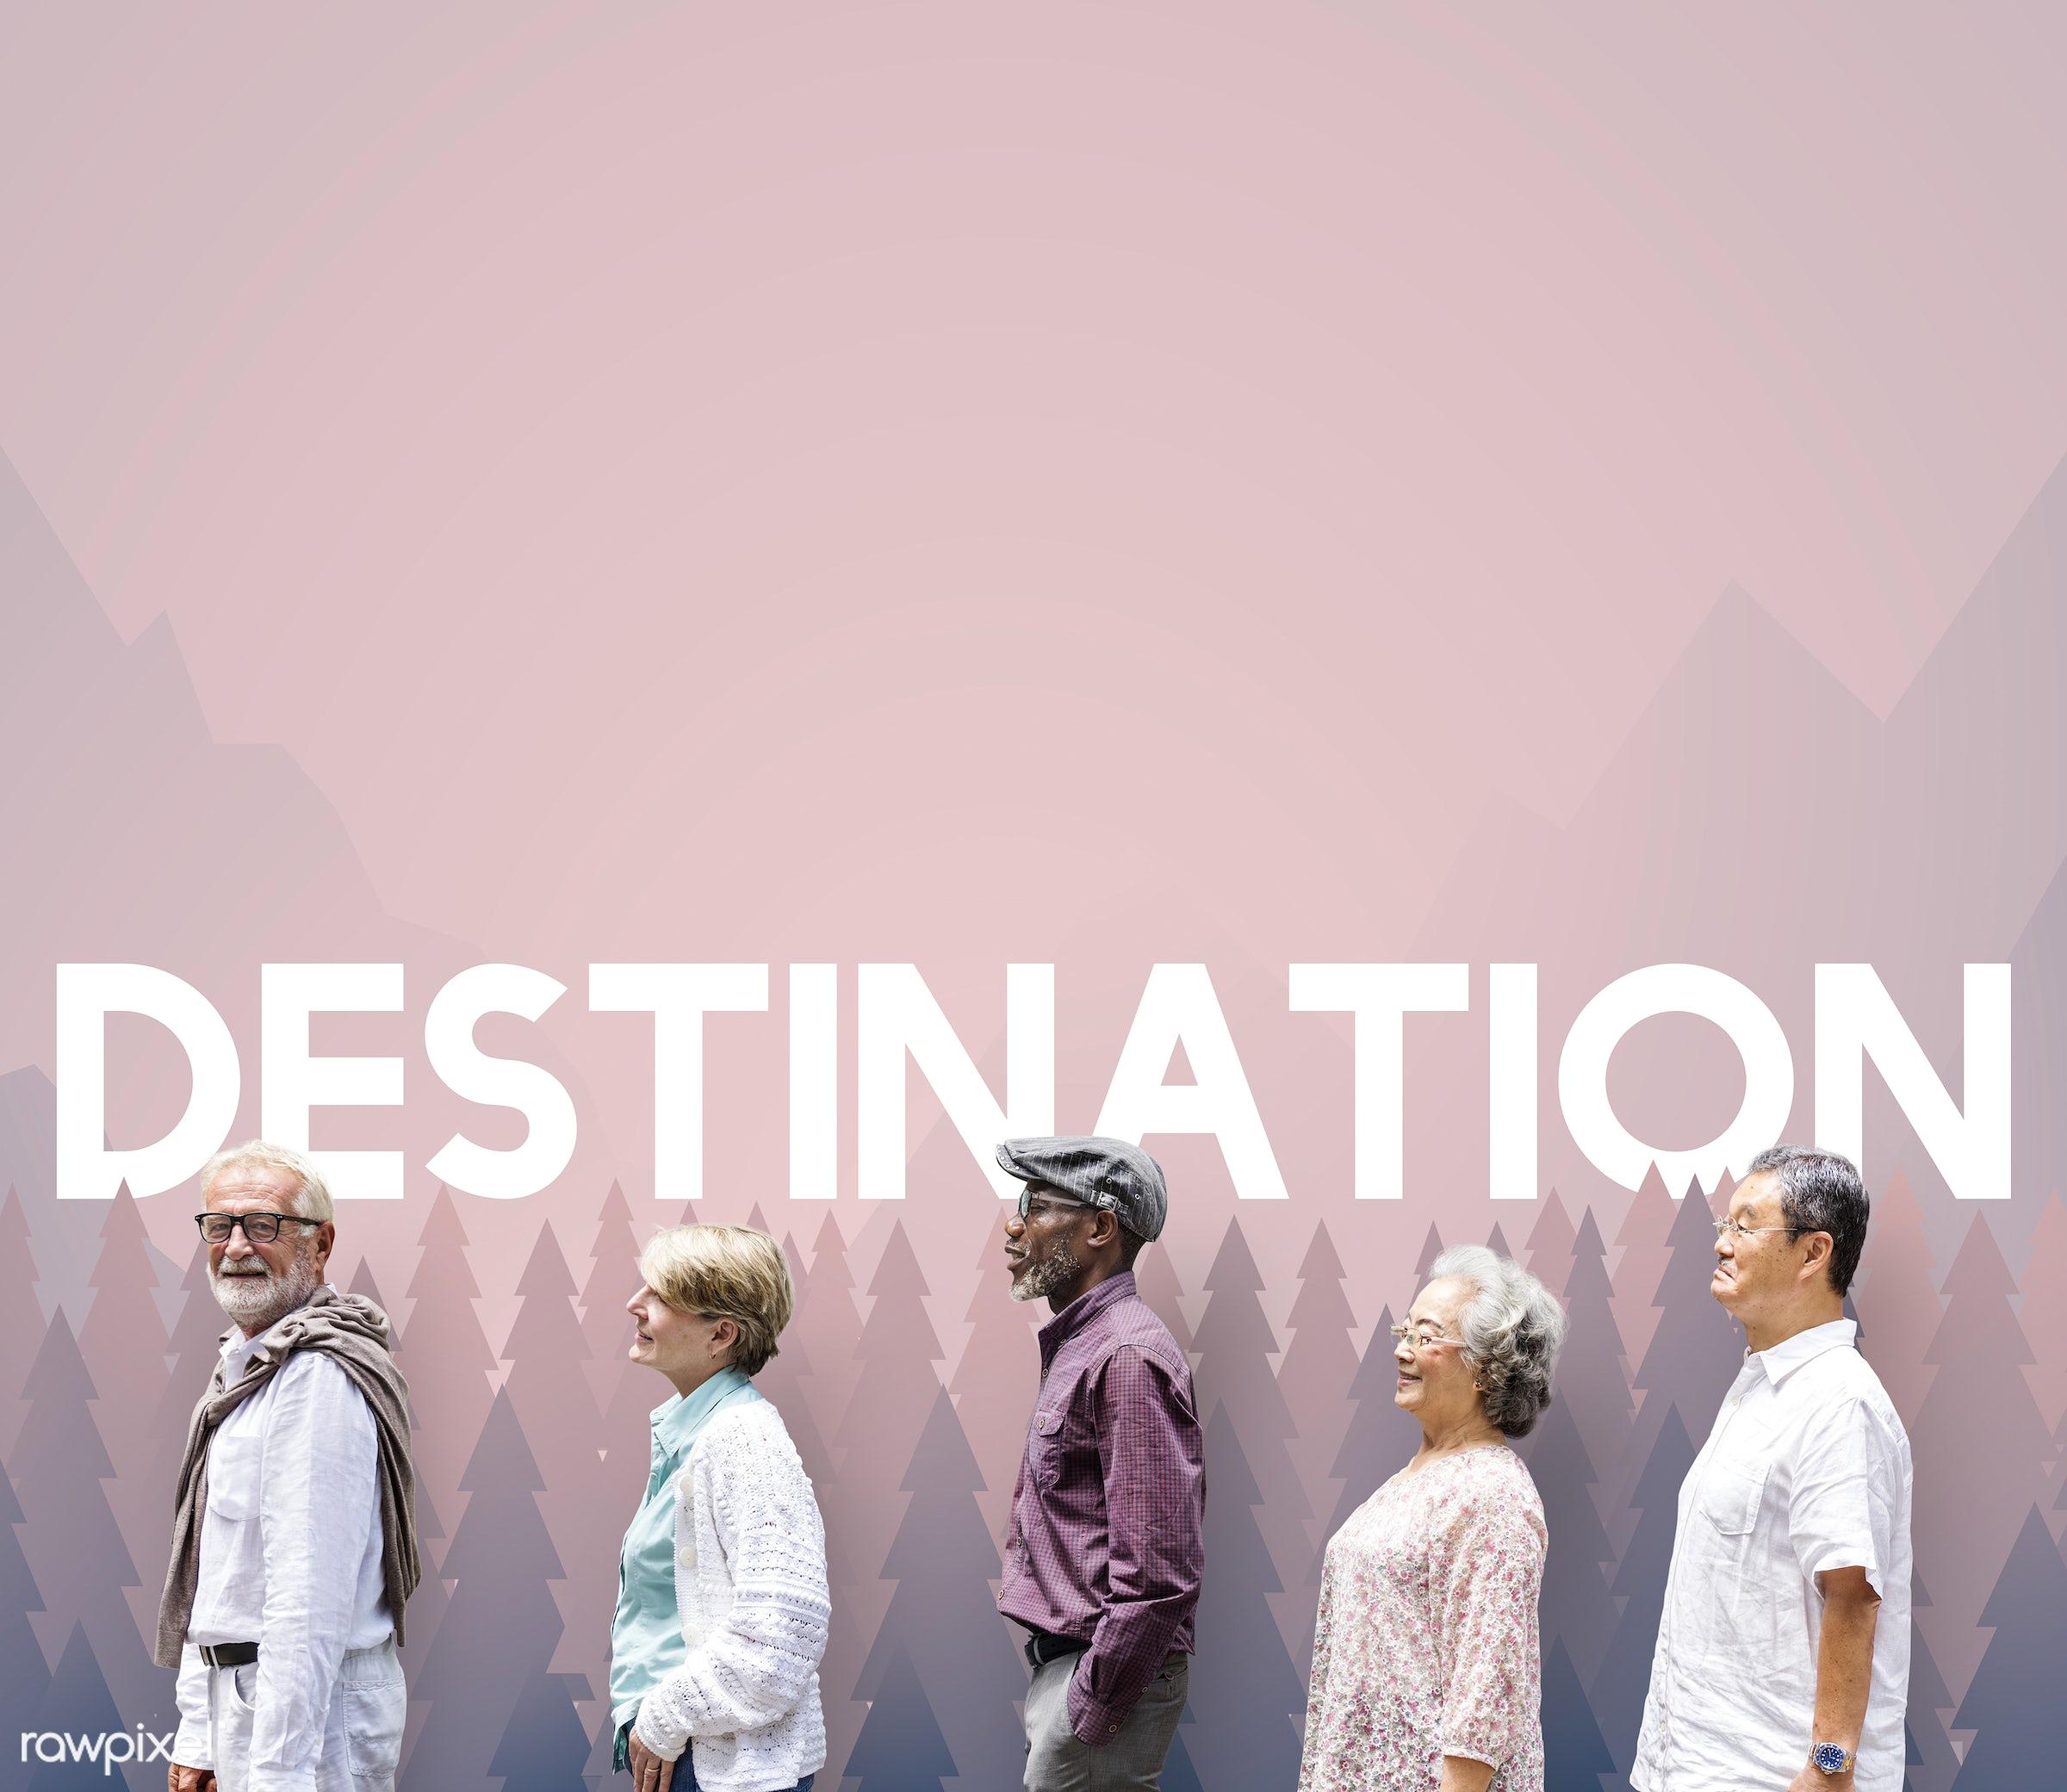 adult, adventure, chill, destination, discovery, diversity, enjoyment, environment, excursion, experience, exploration,...